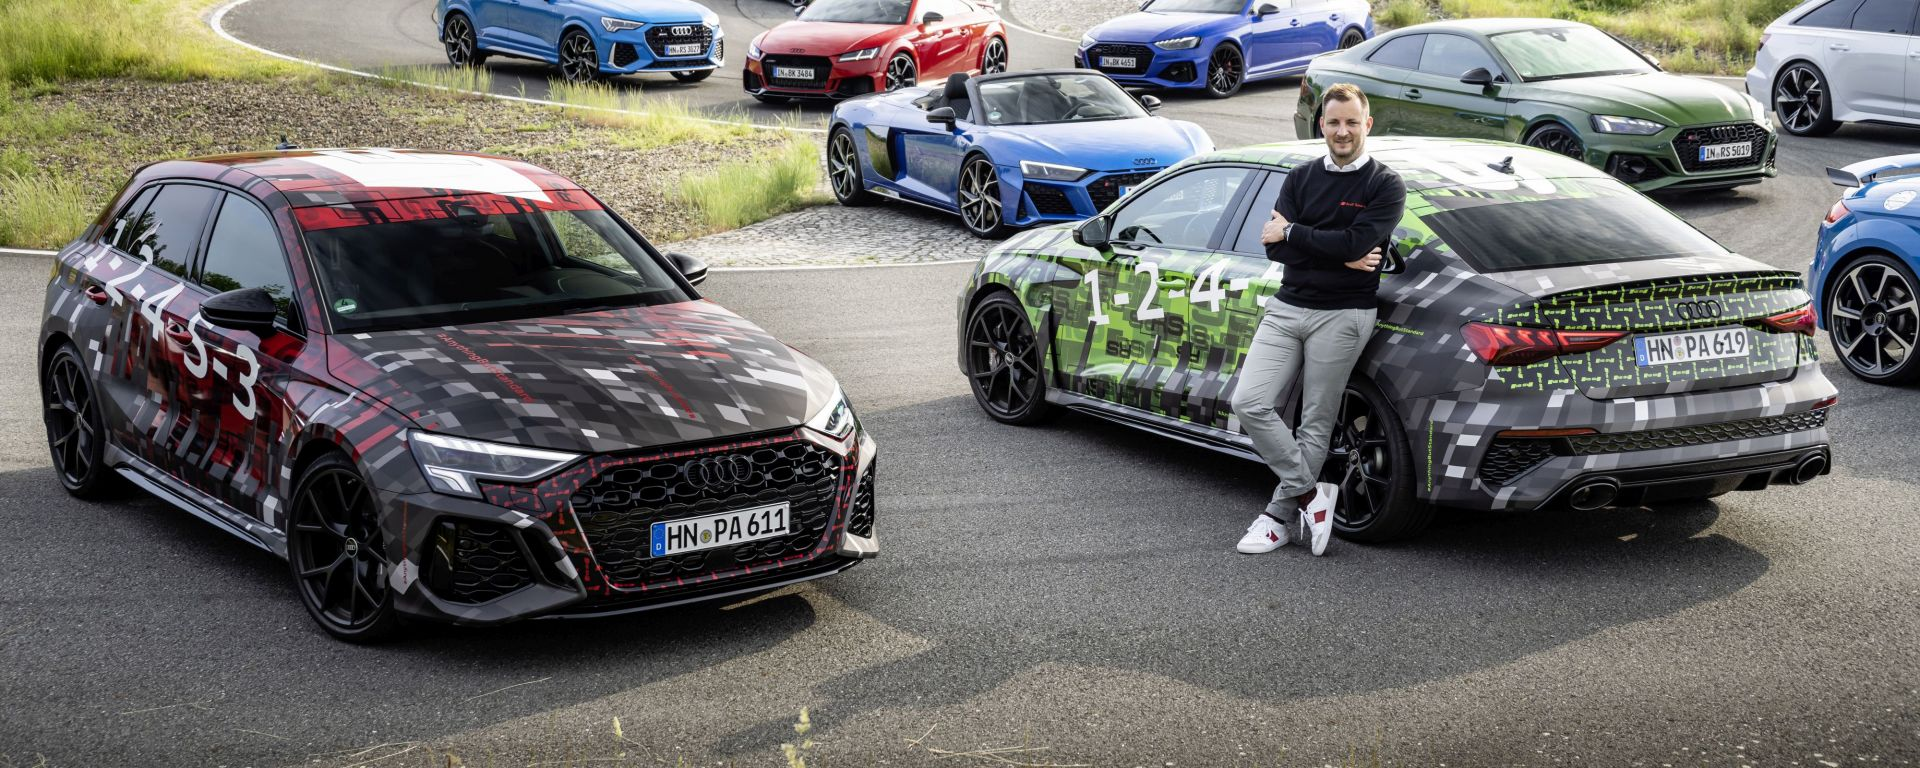 Nuova Audi RS3 Sedan e Sportback: le prime foto ufficiali